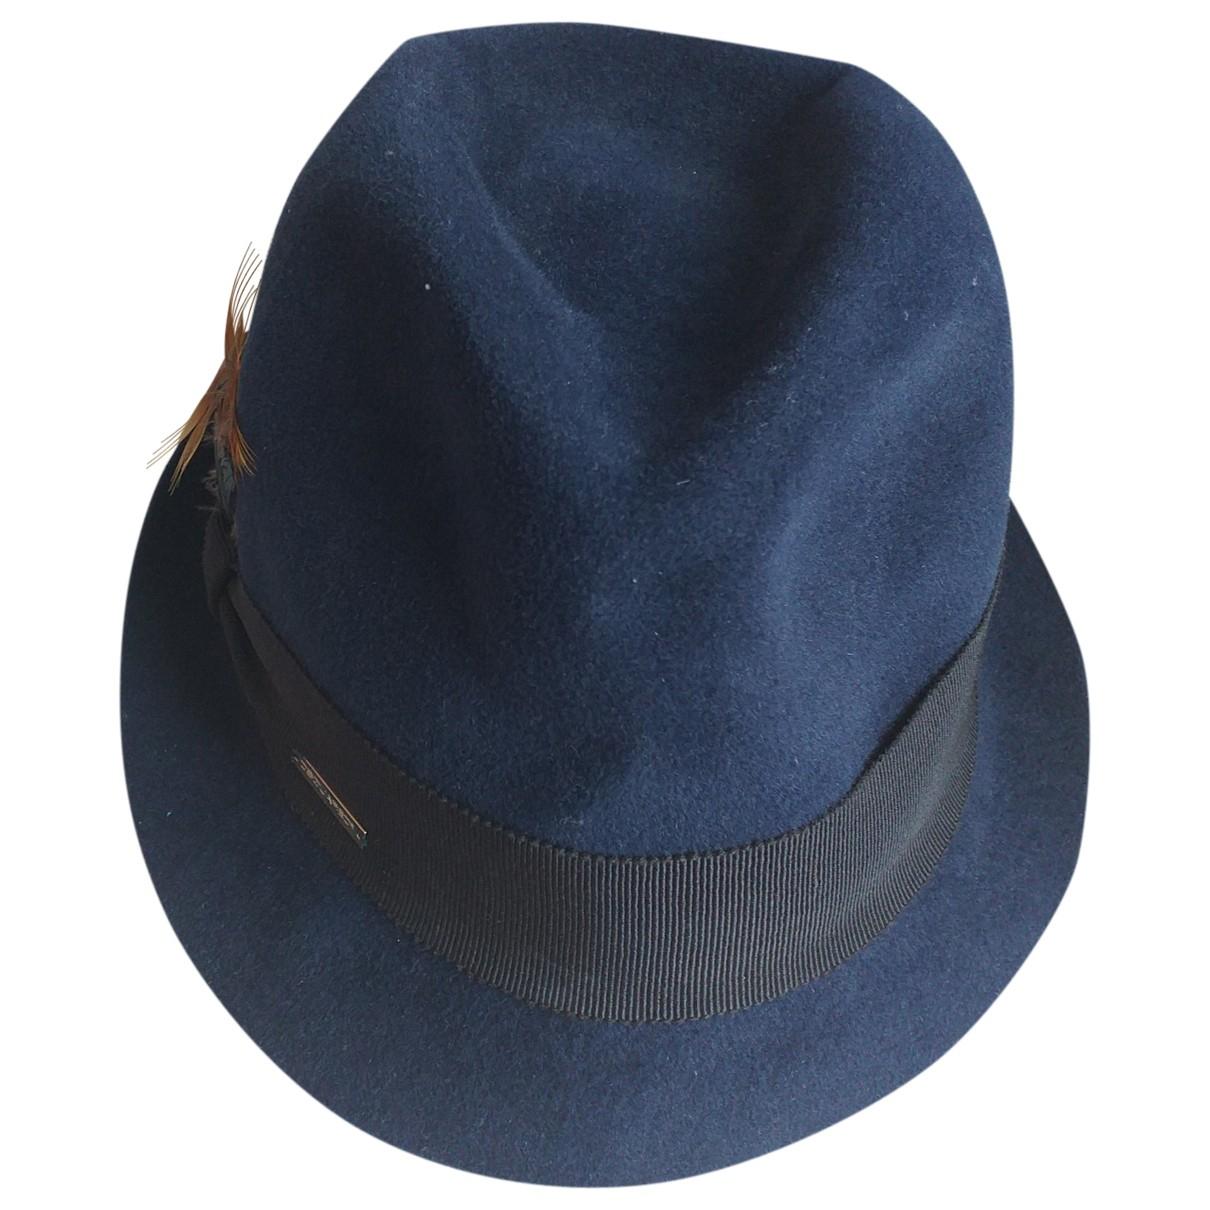 Dsquared2 \N Hut, Muetzen in  Blau Baumwolle